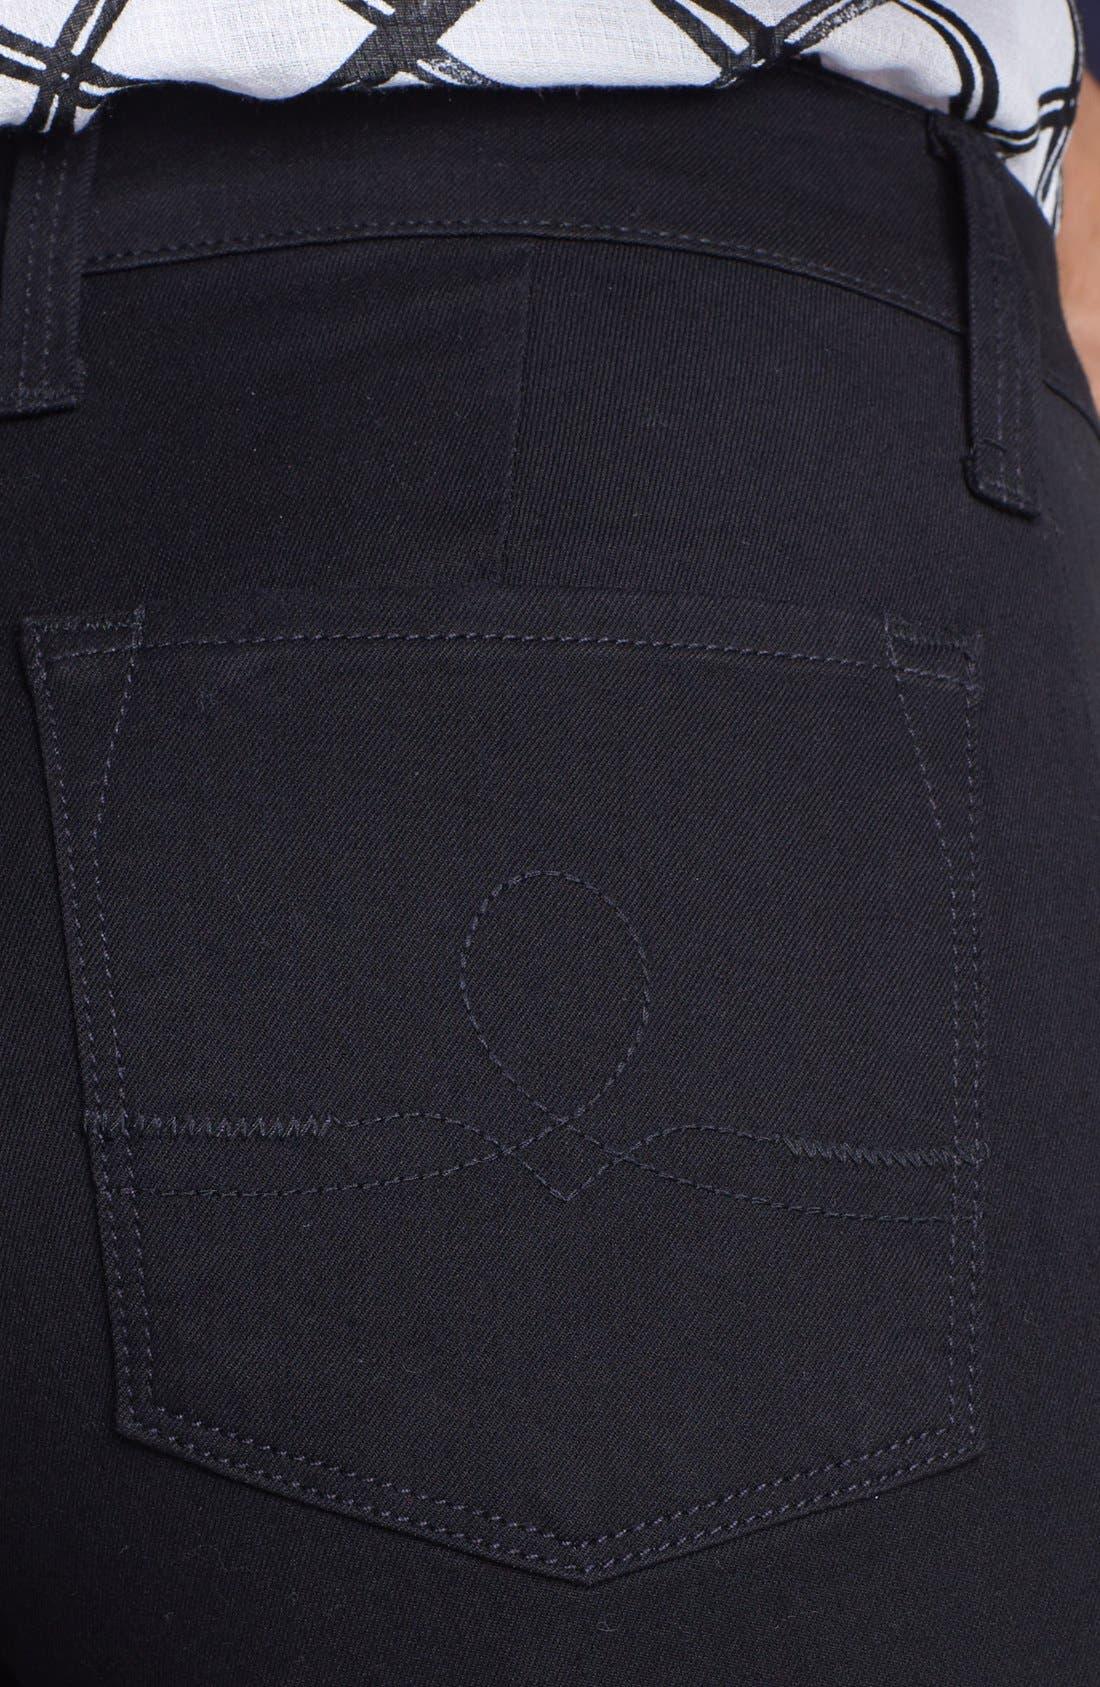 Alternate Image 3  - Lucky Brand 'Sofia' Tuxedo Detail Skinny Jeans (Jededia)